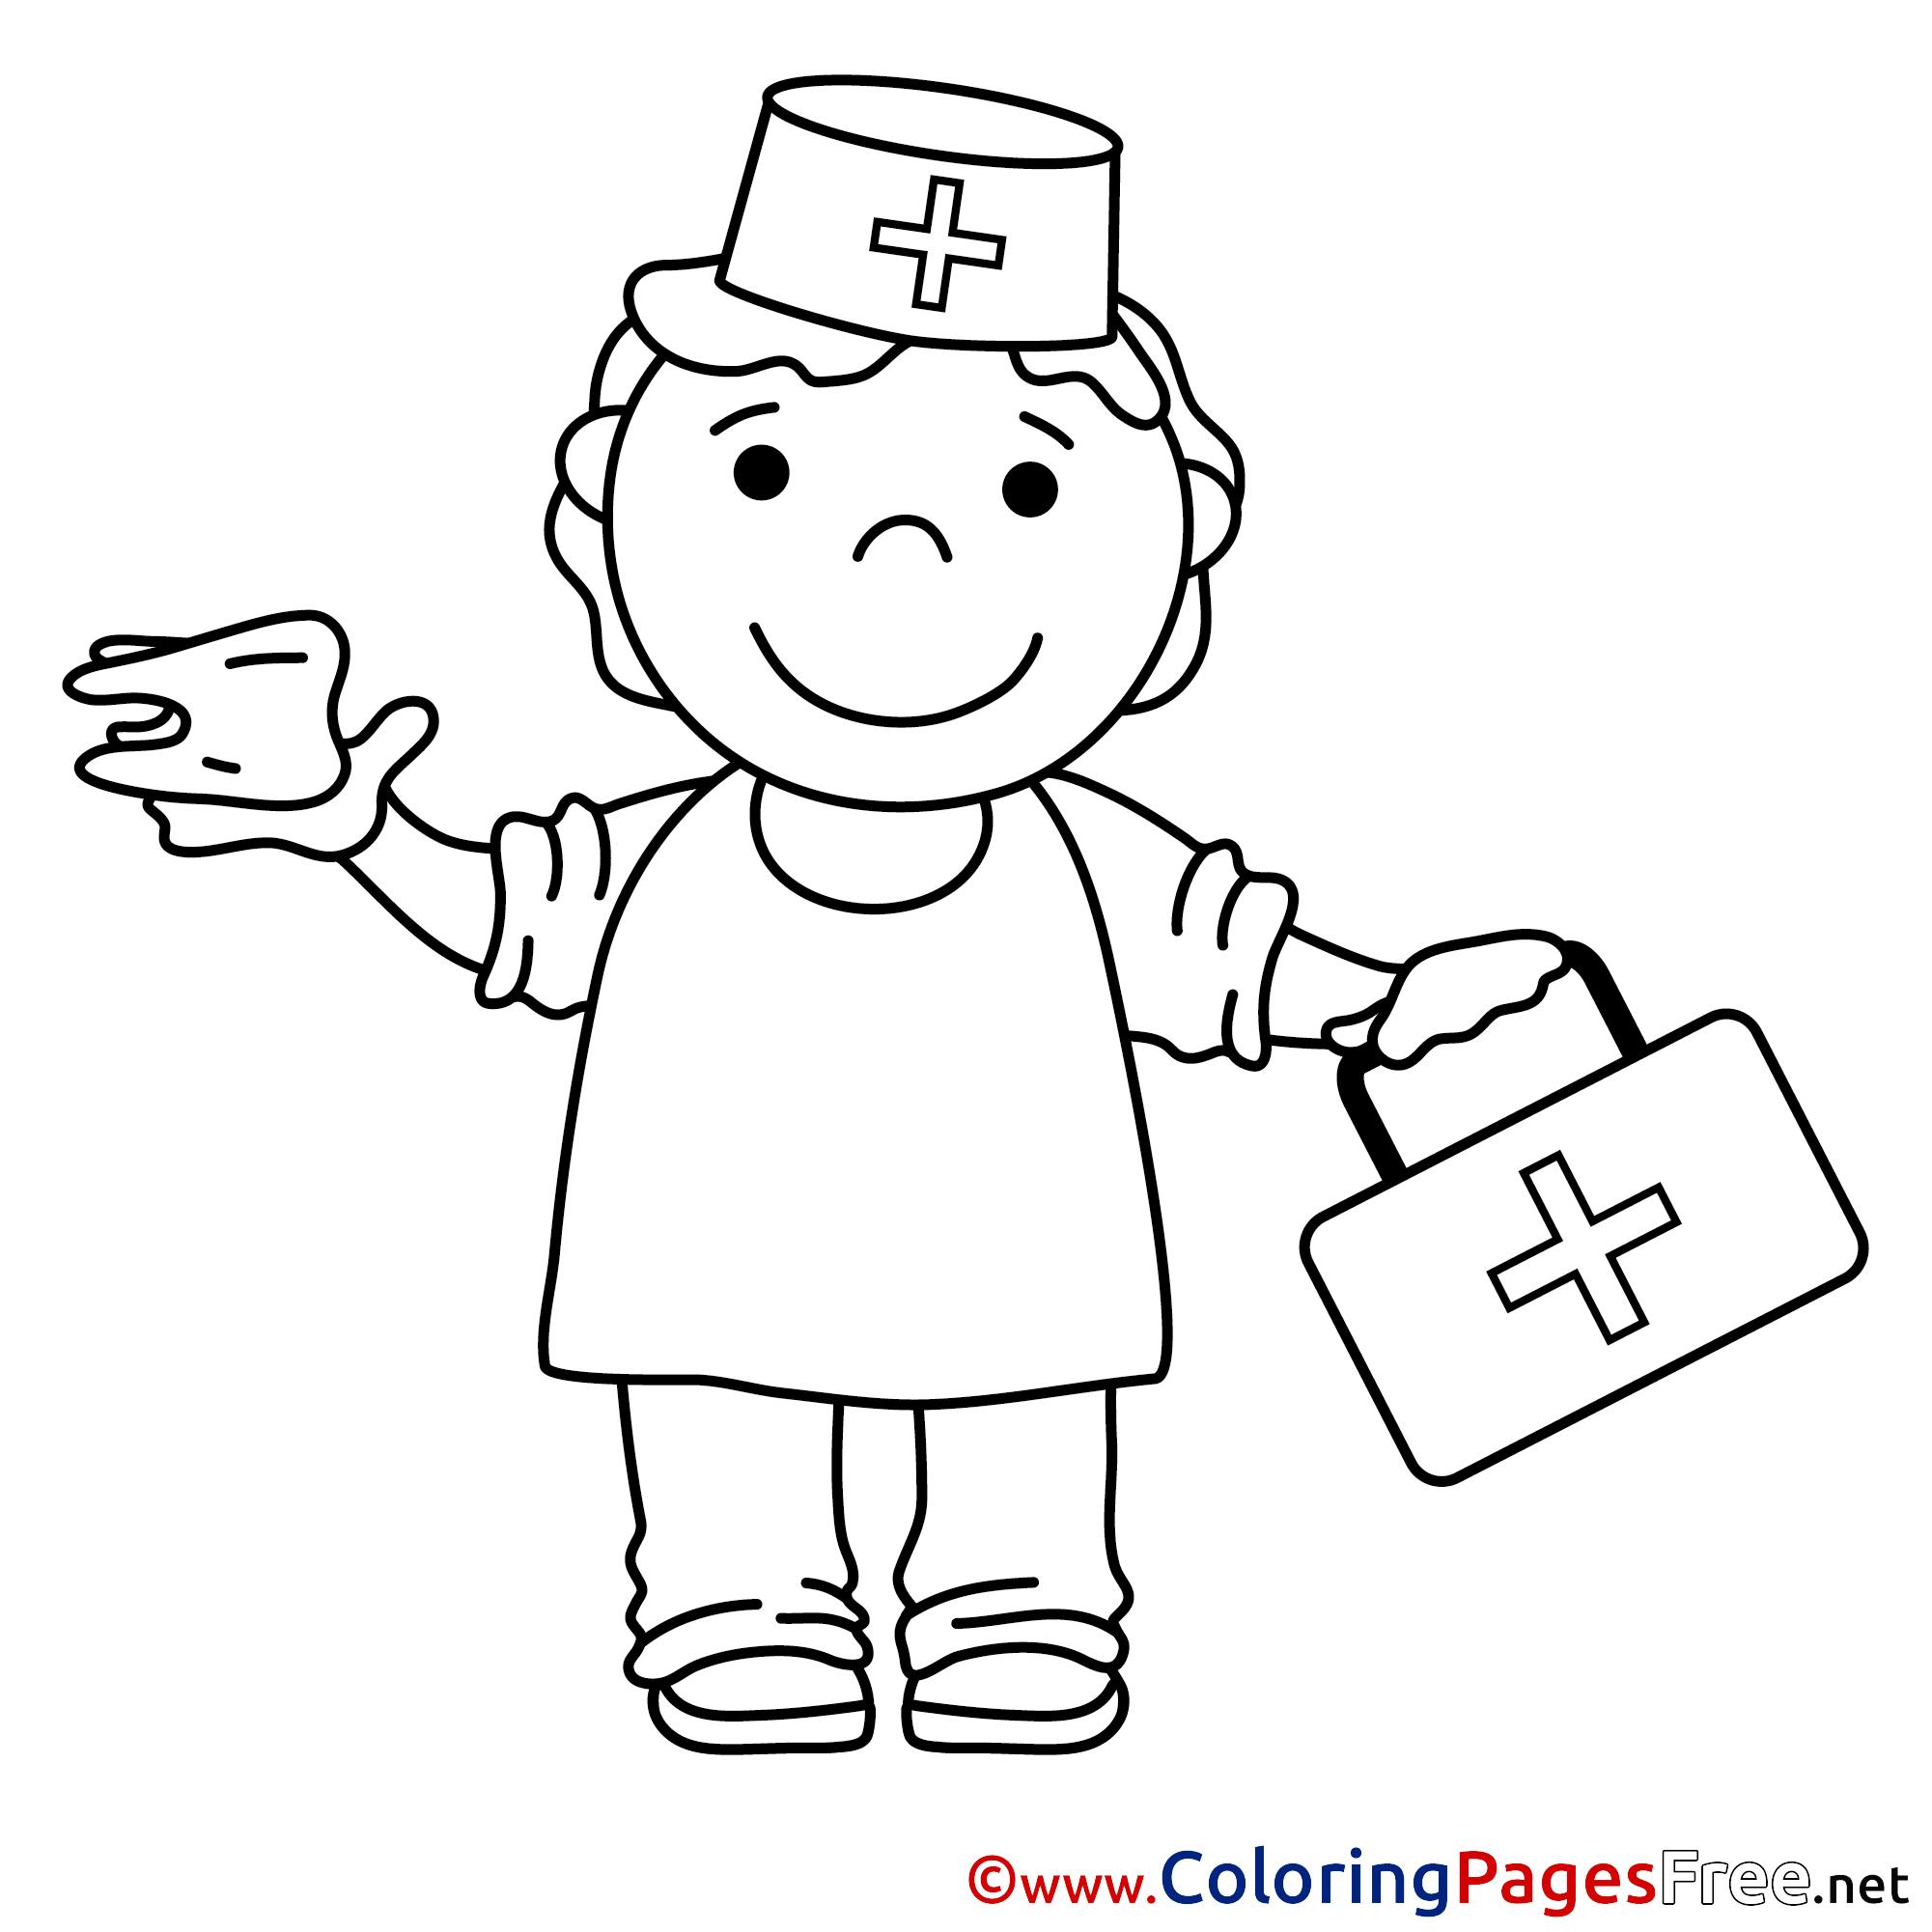 Nurse Colouring Sheet download free